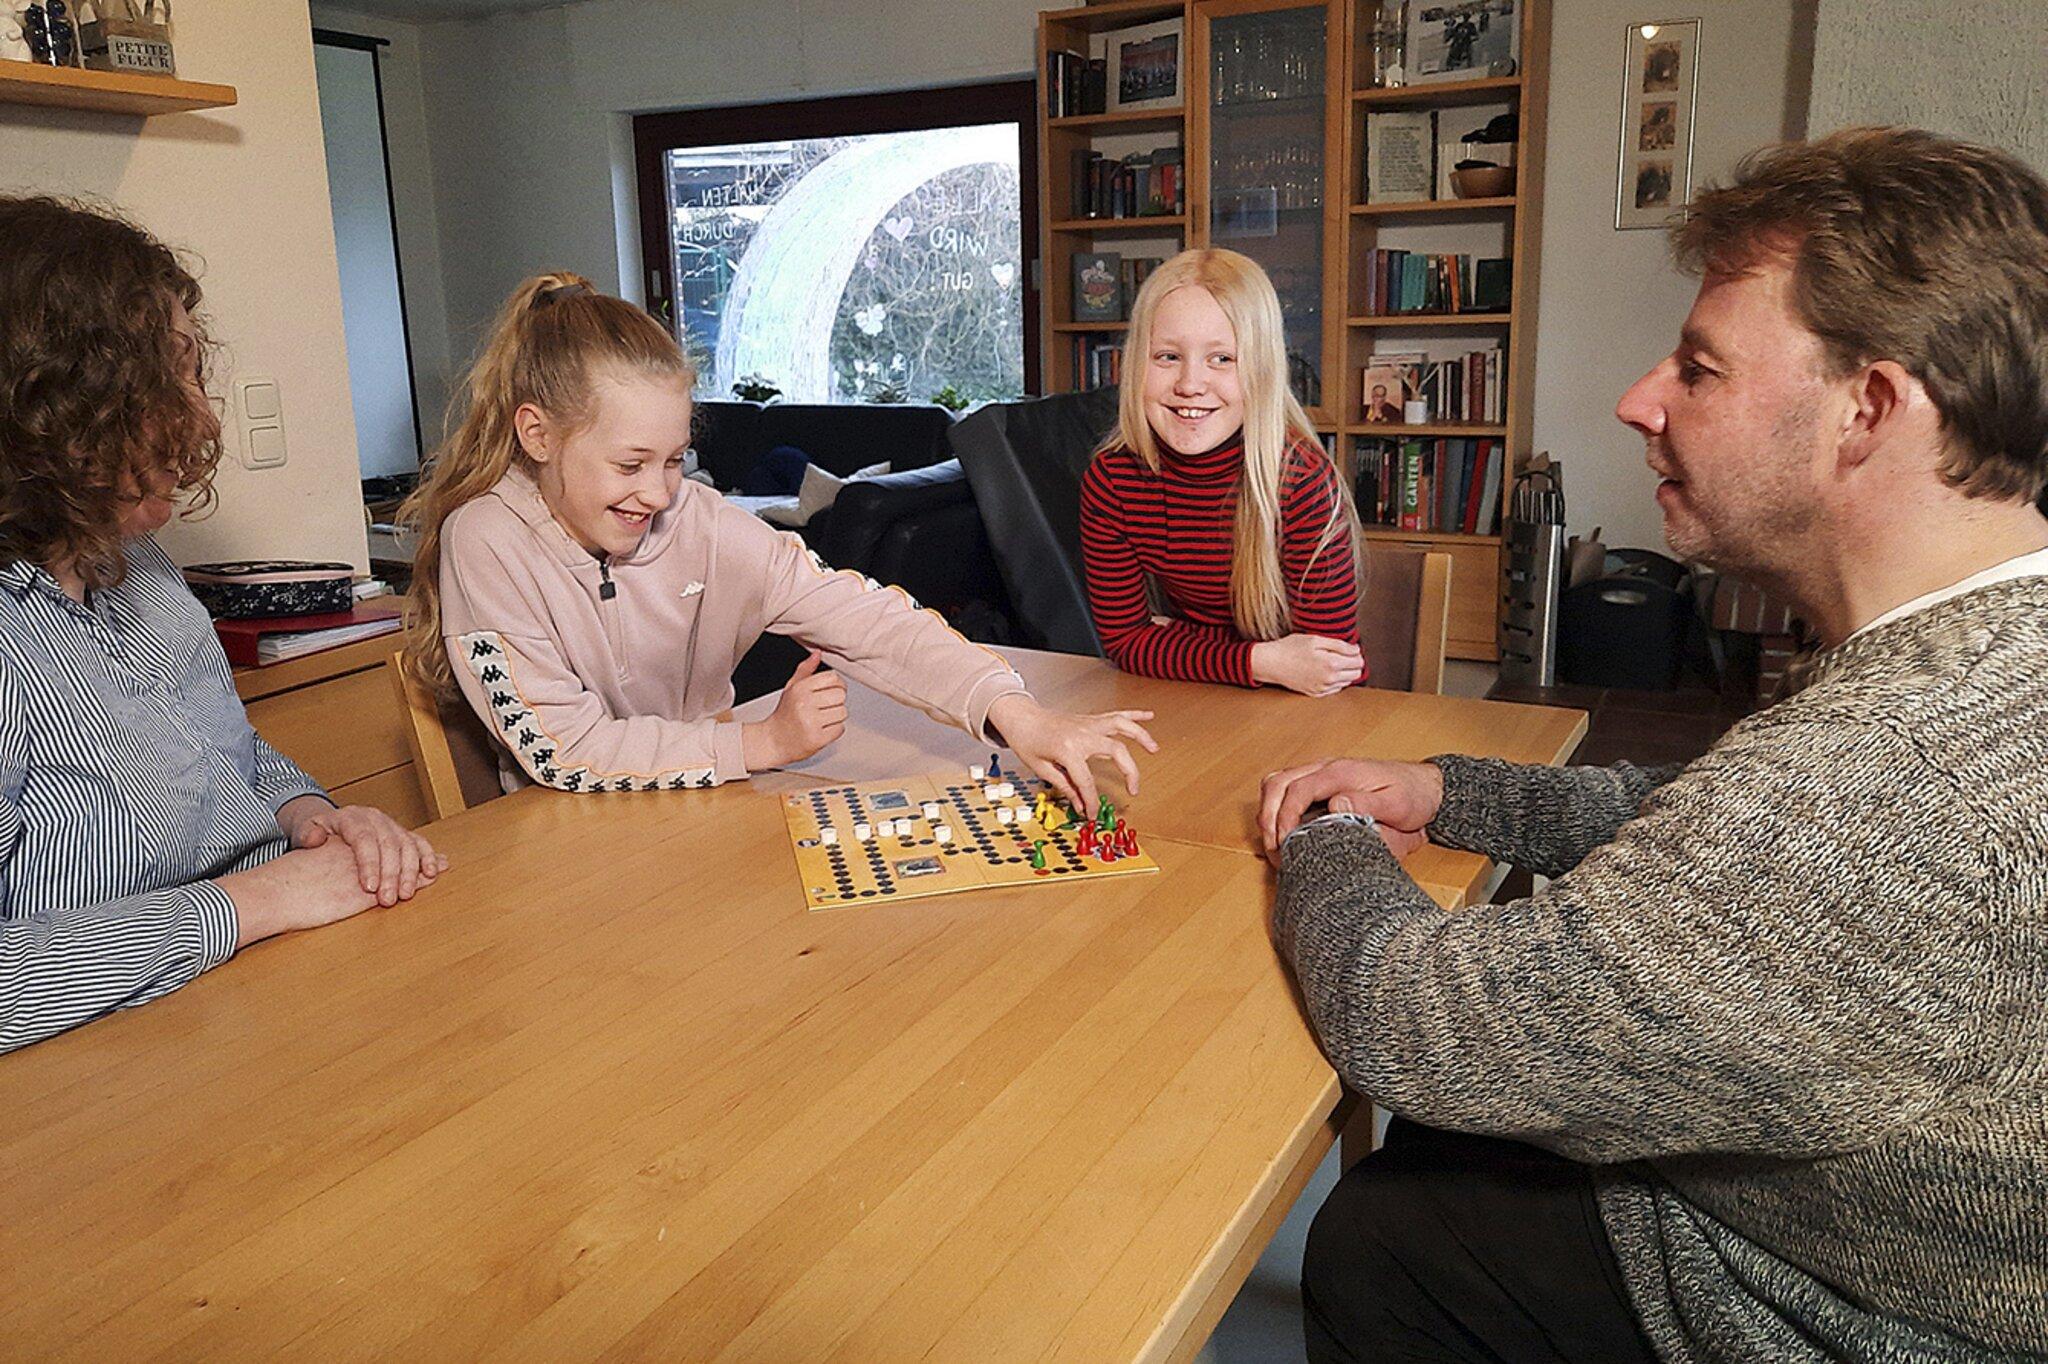 Buxtehuder als Gast in neuem Web-Format                                                                  Rechtsanwalt Christian Au will Hilfe zur Selbsthilfe leisten